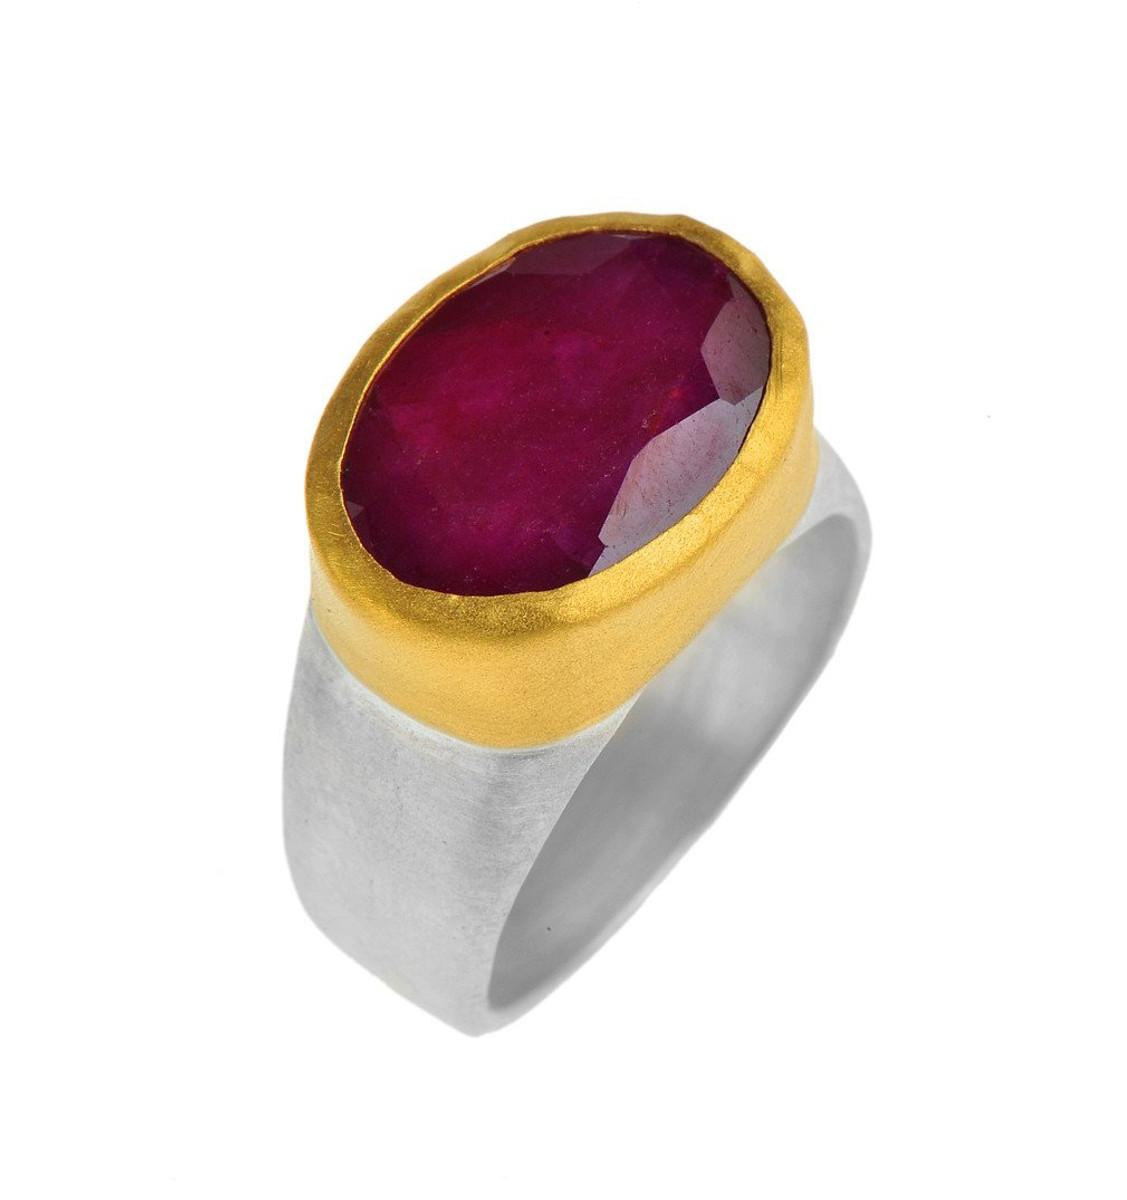 Obsession Ruby Ring by Nava Zahavi - New Arrival